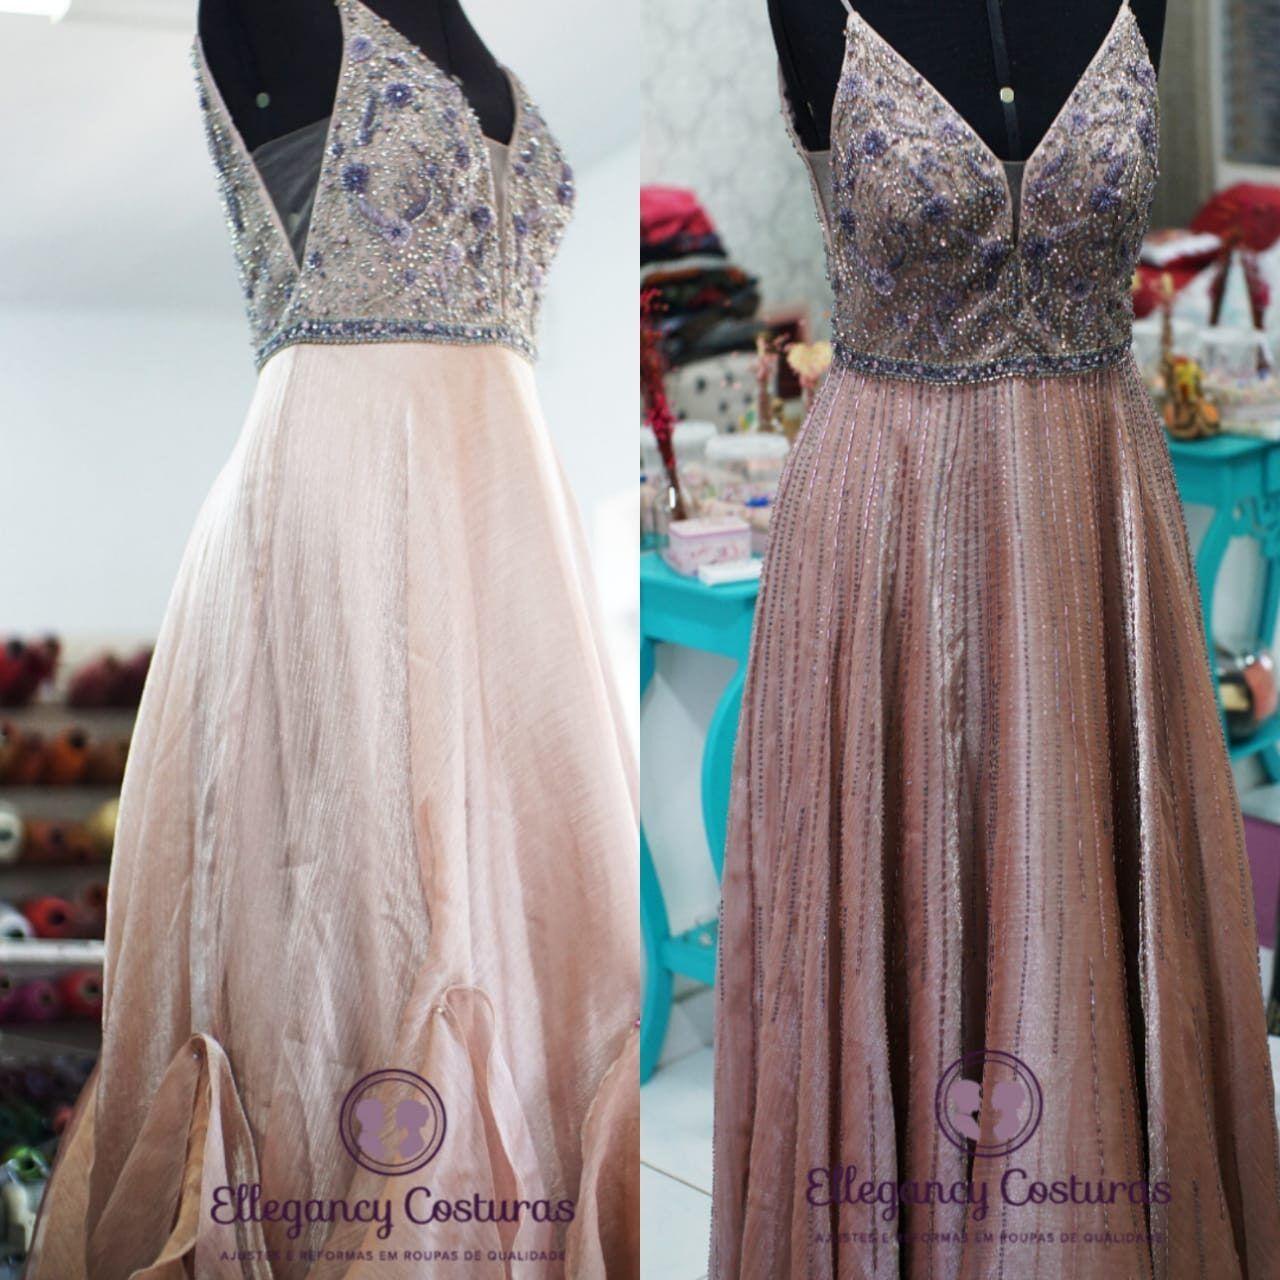 vestido-de-festa-bordado-antes-e-depois-ellegancy-costuras-9476398